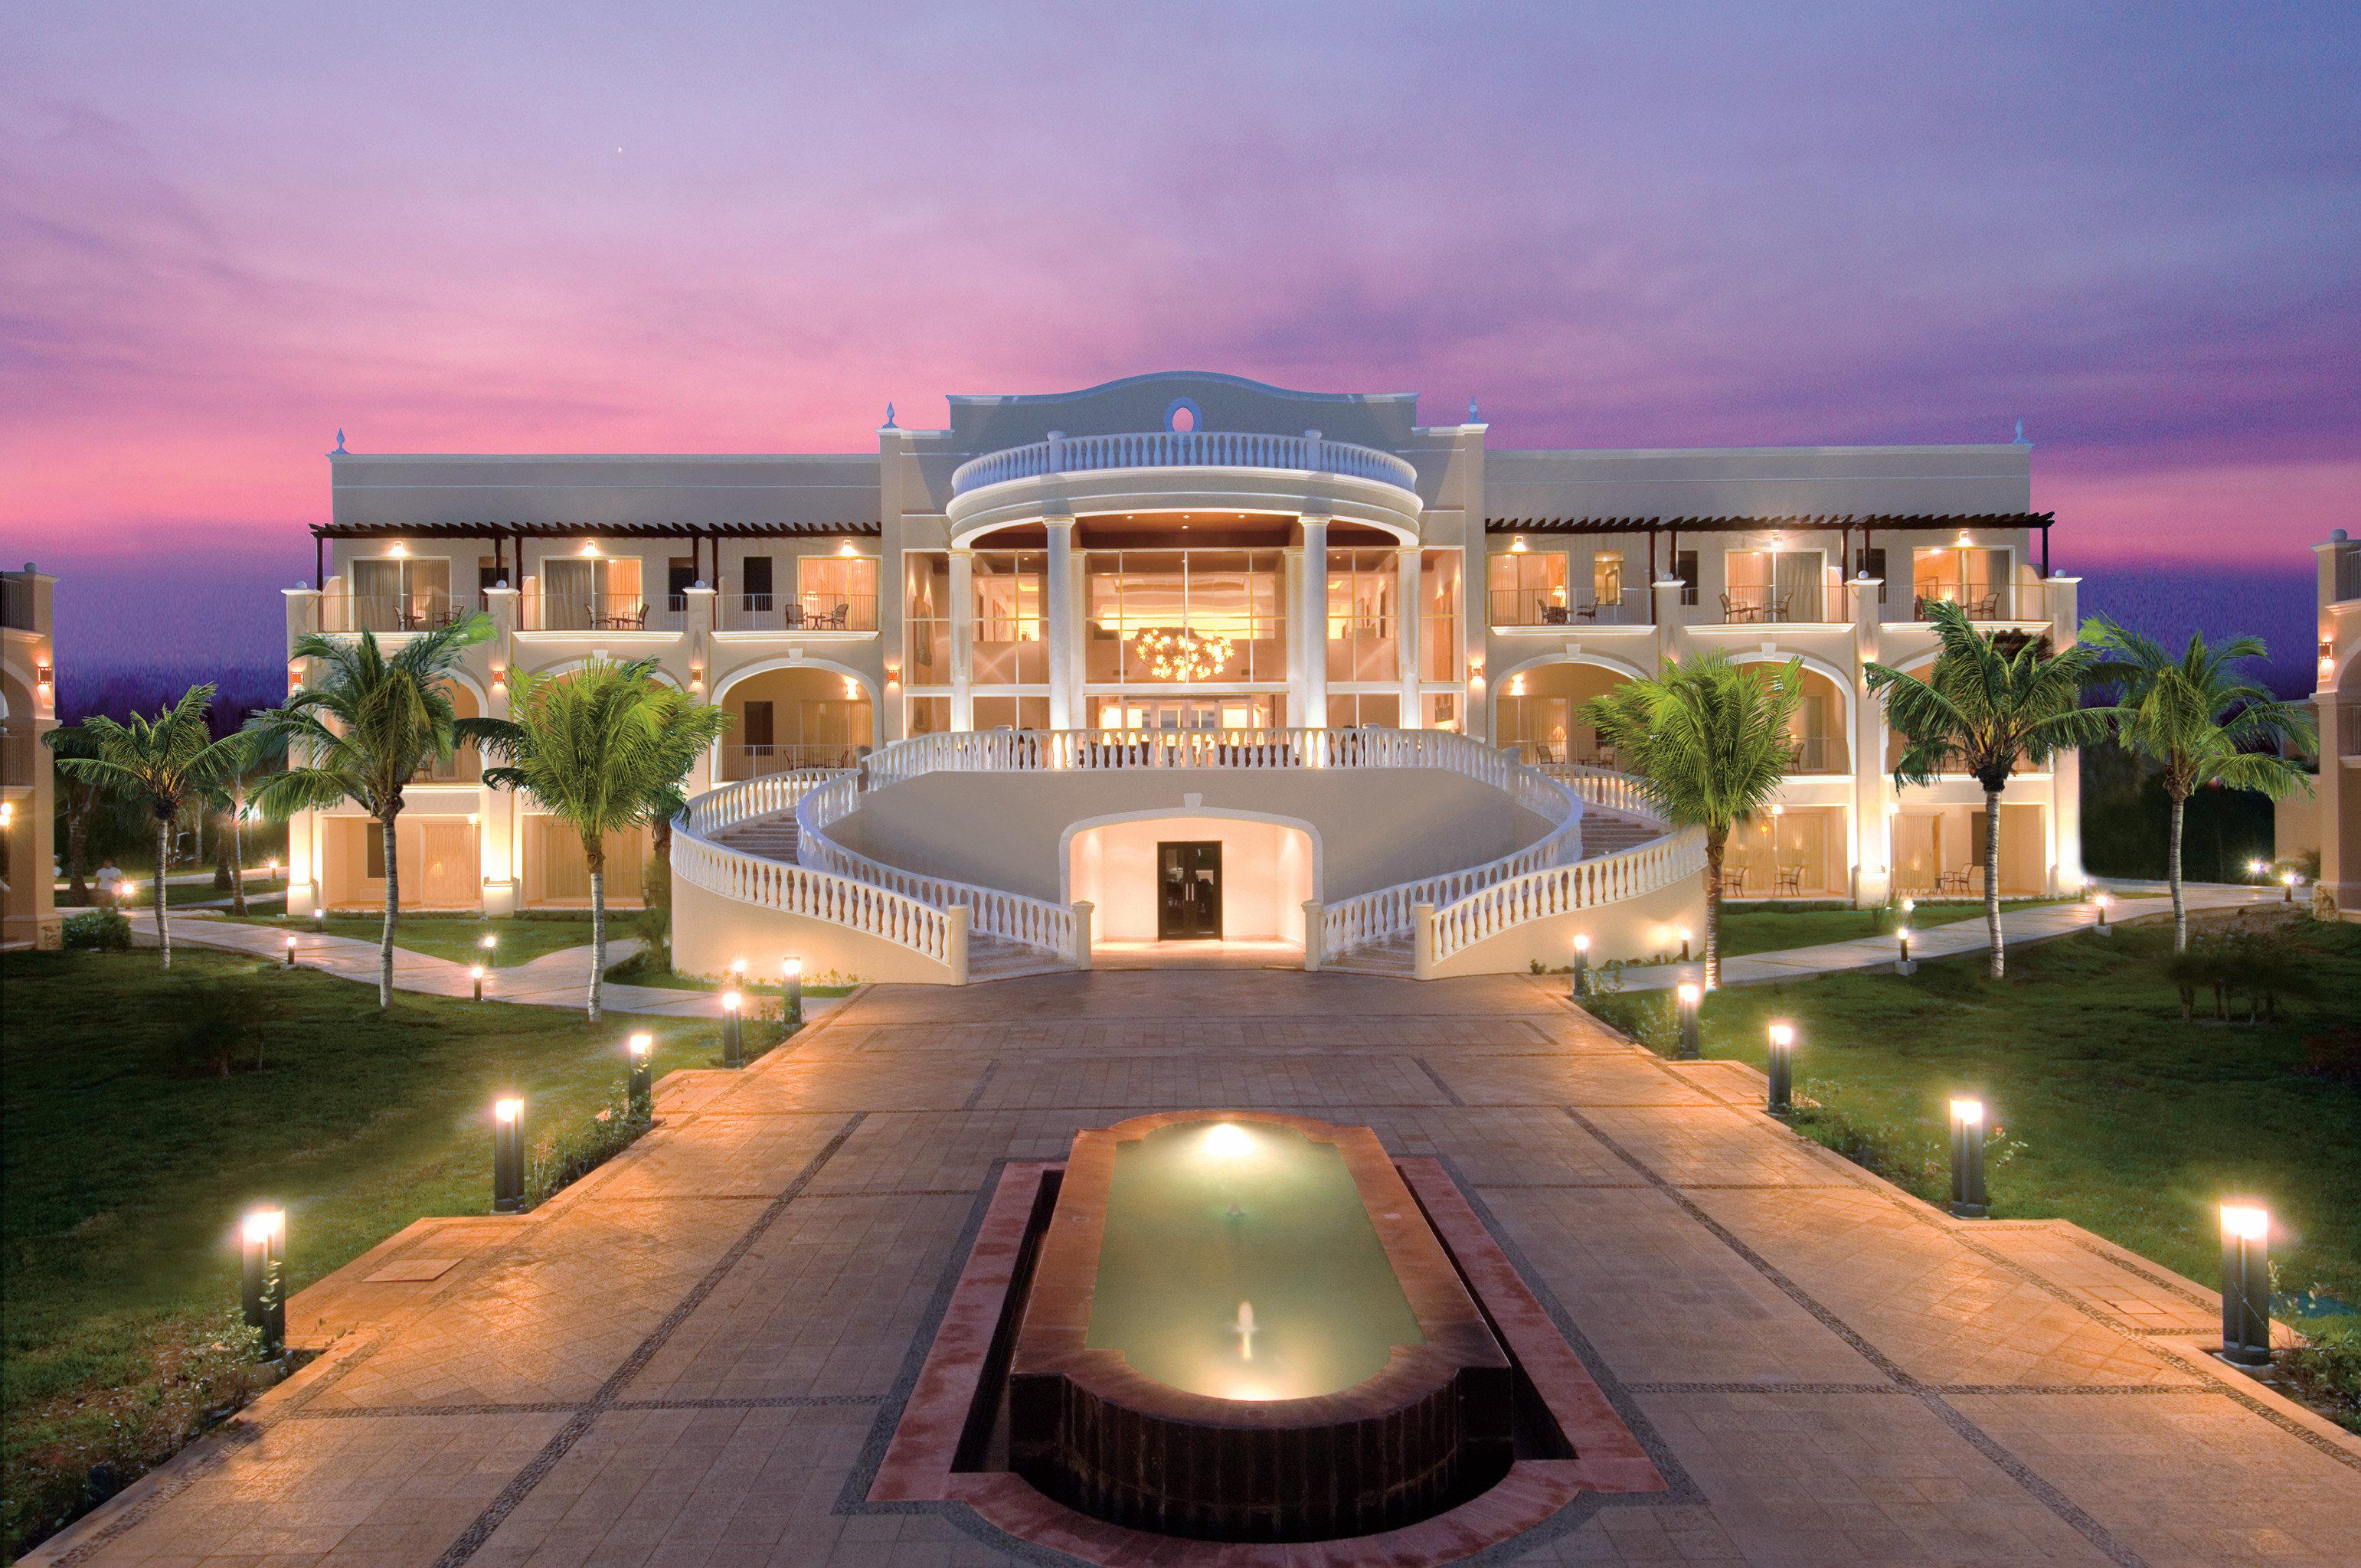 Hotels Romance sky outdoor property estate Resort mansion condominium home plaza real estate